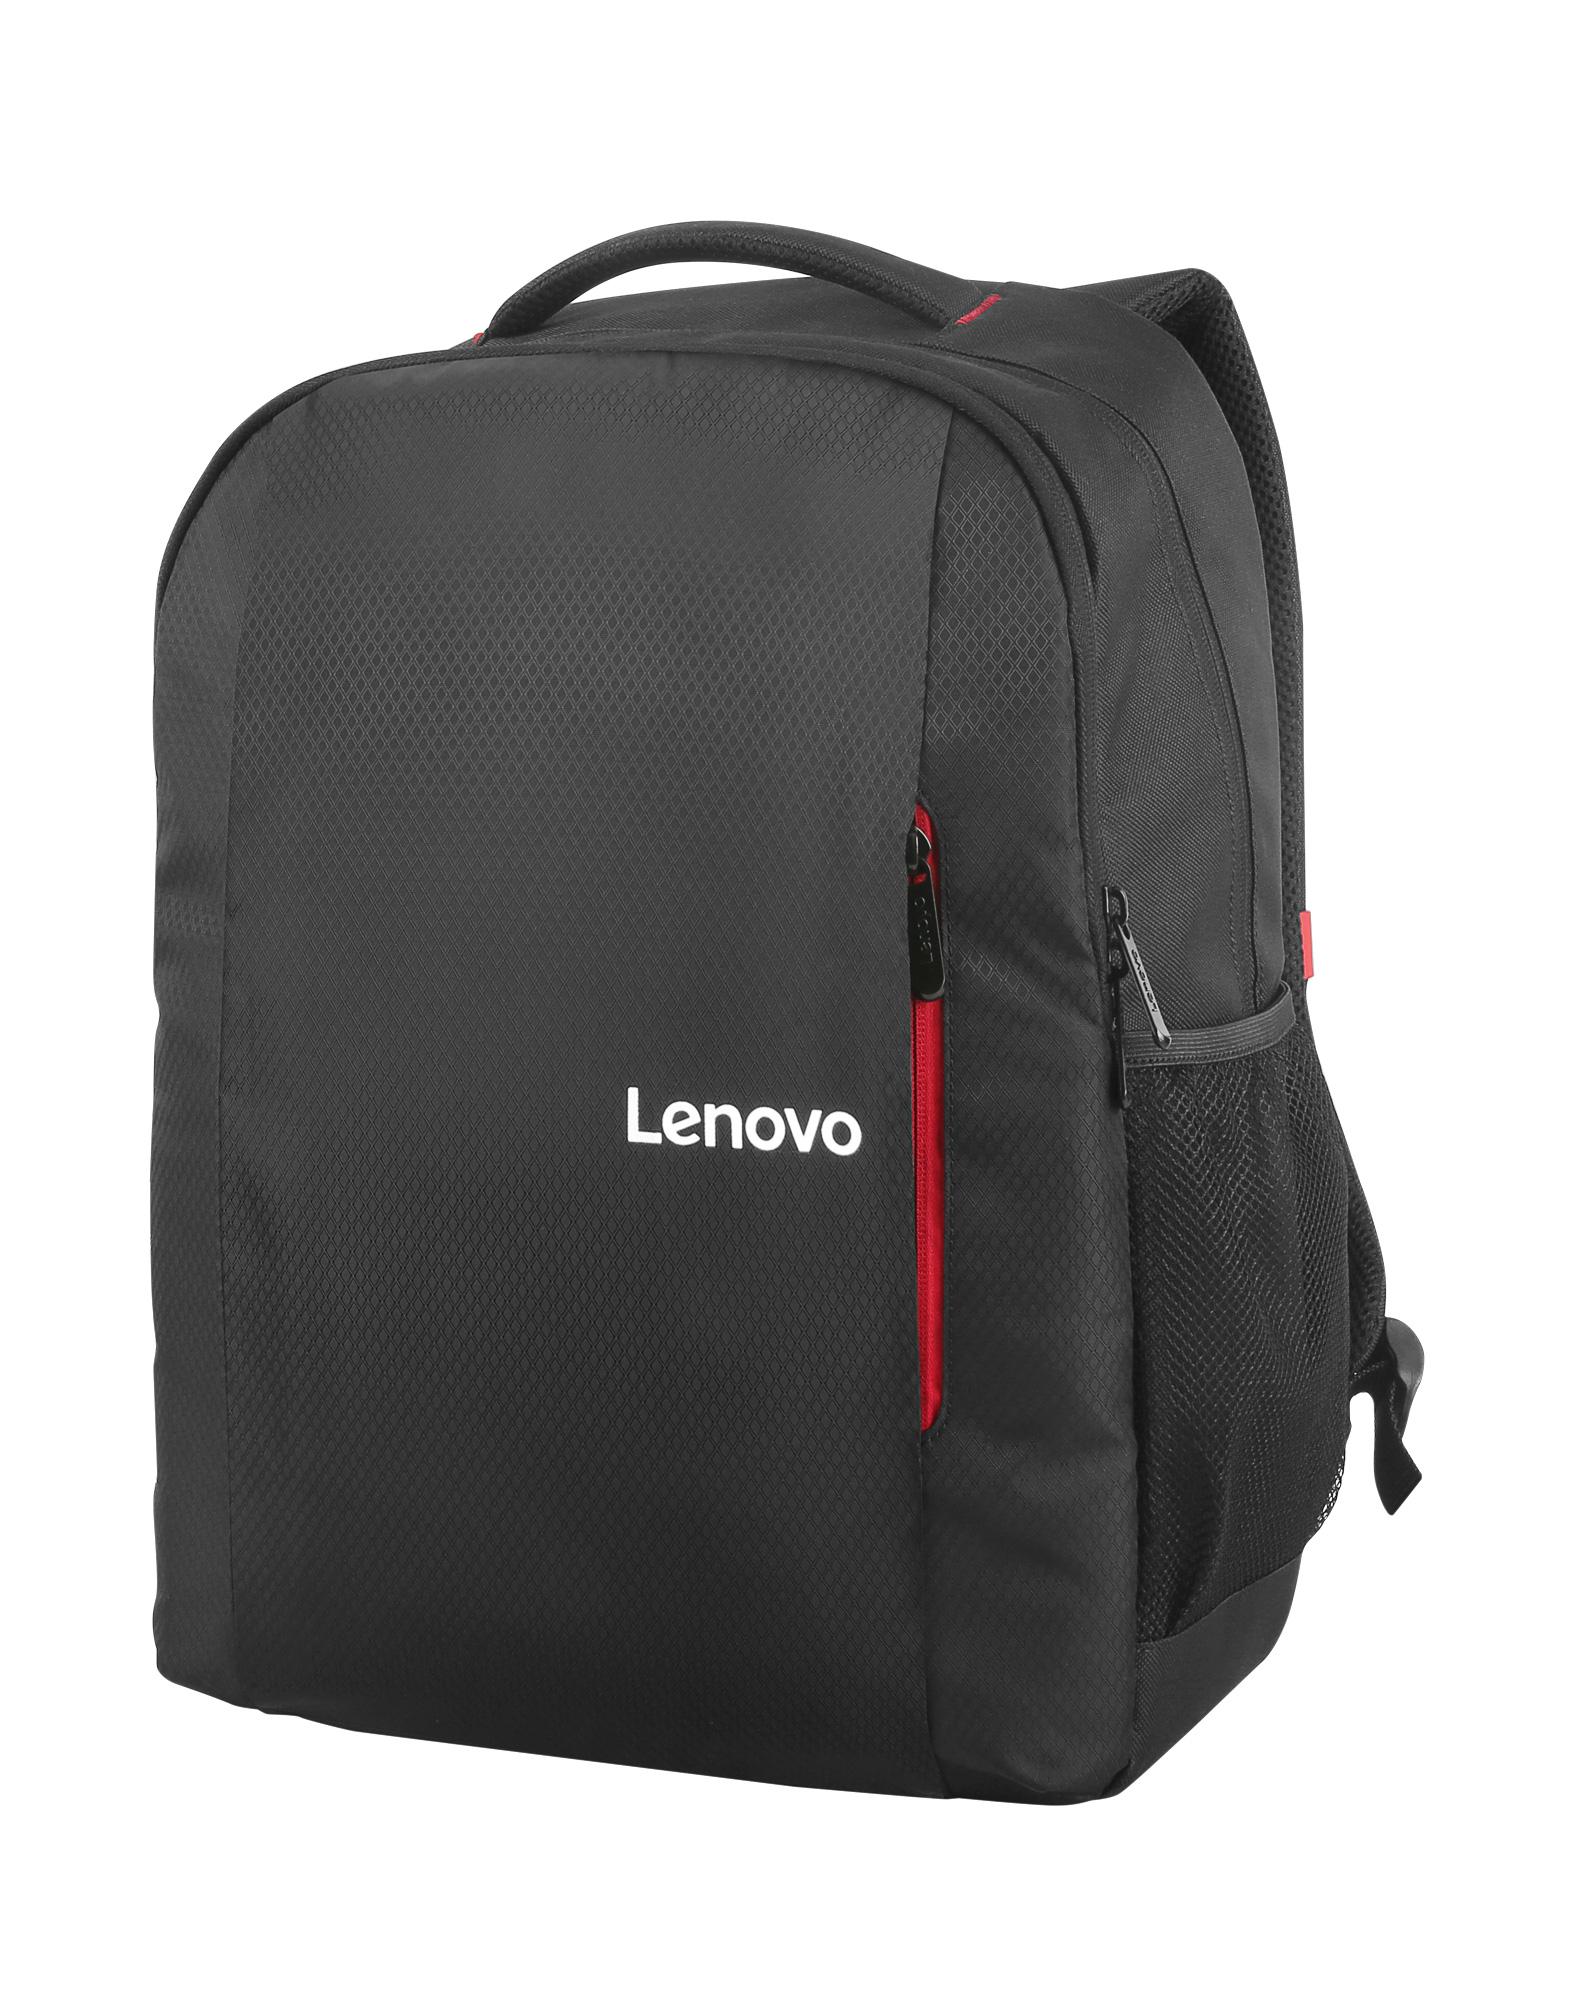 "Фото 1. Рюкзак Lenovo 15.6"" Laptop Everyday Backpack B515 Black (GX40Q75215)"